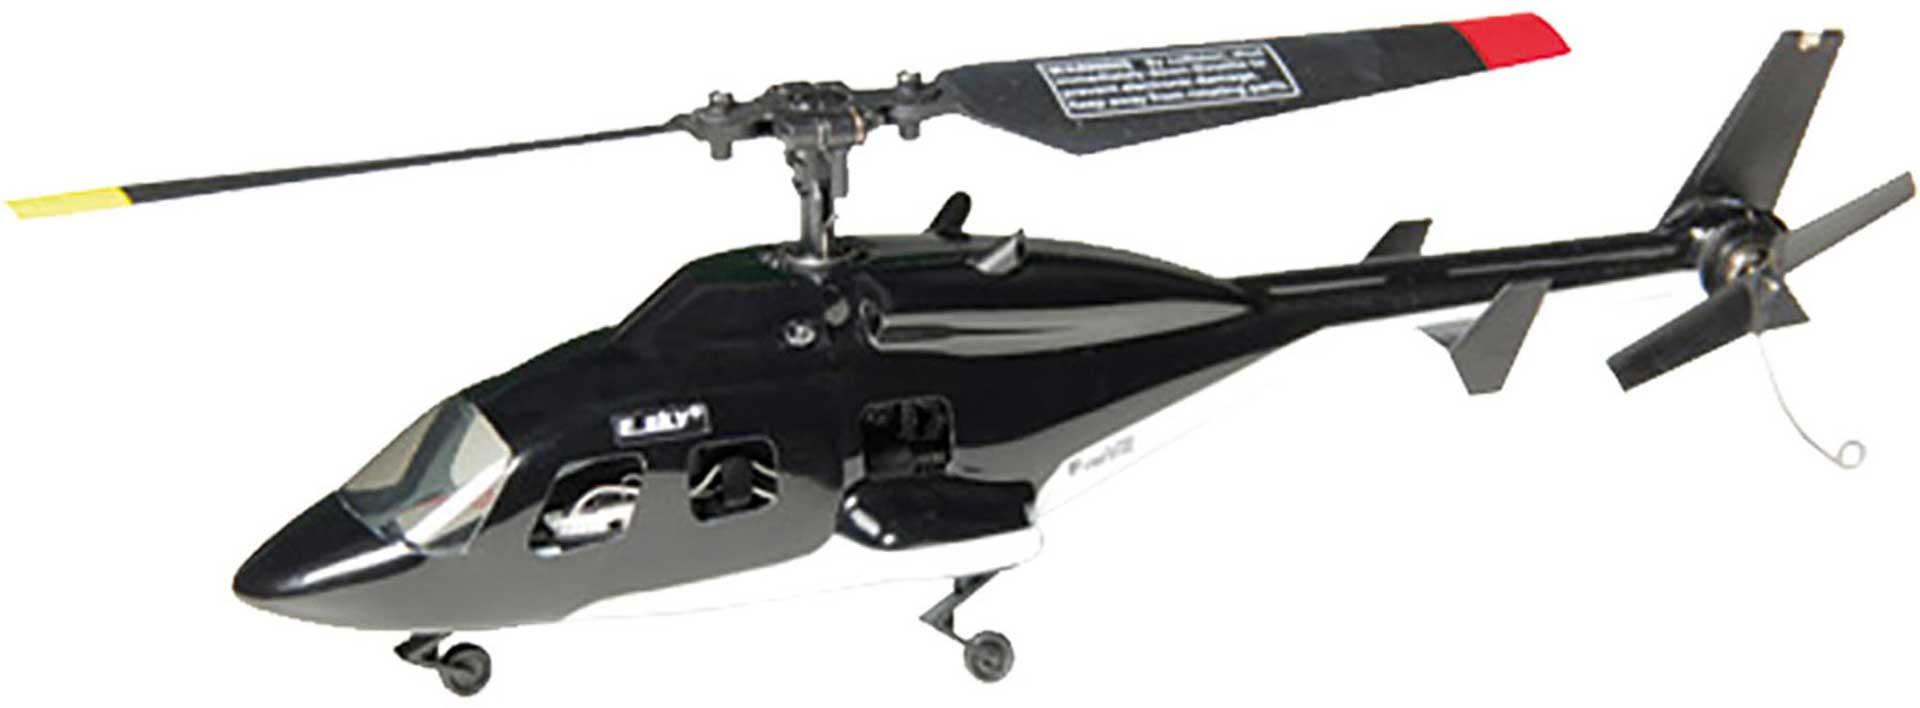 E-SKY F150 V2 MINI HELIKOPTER AIRWOLF RTF M2 MODE 2 Hubschrauber / Helikopter